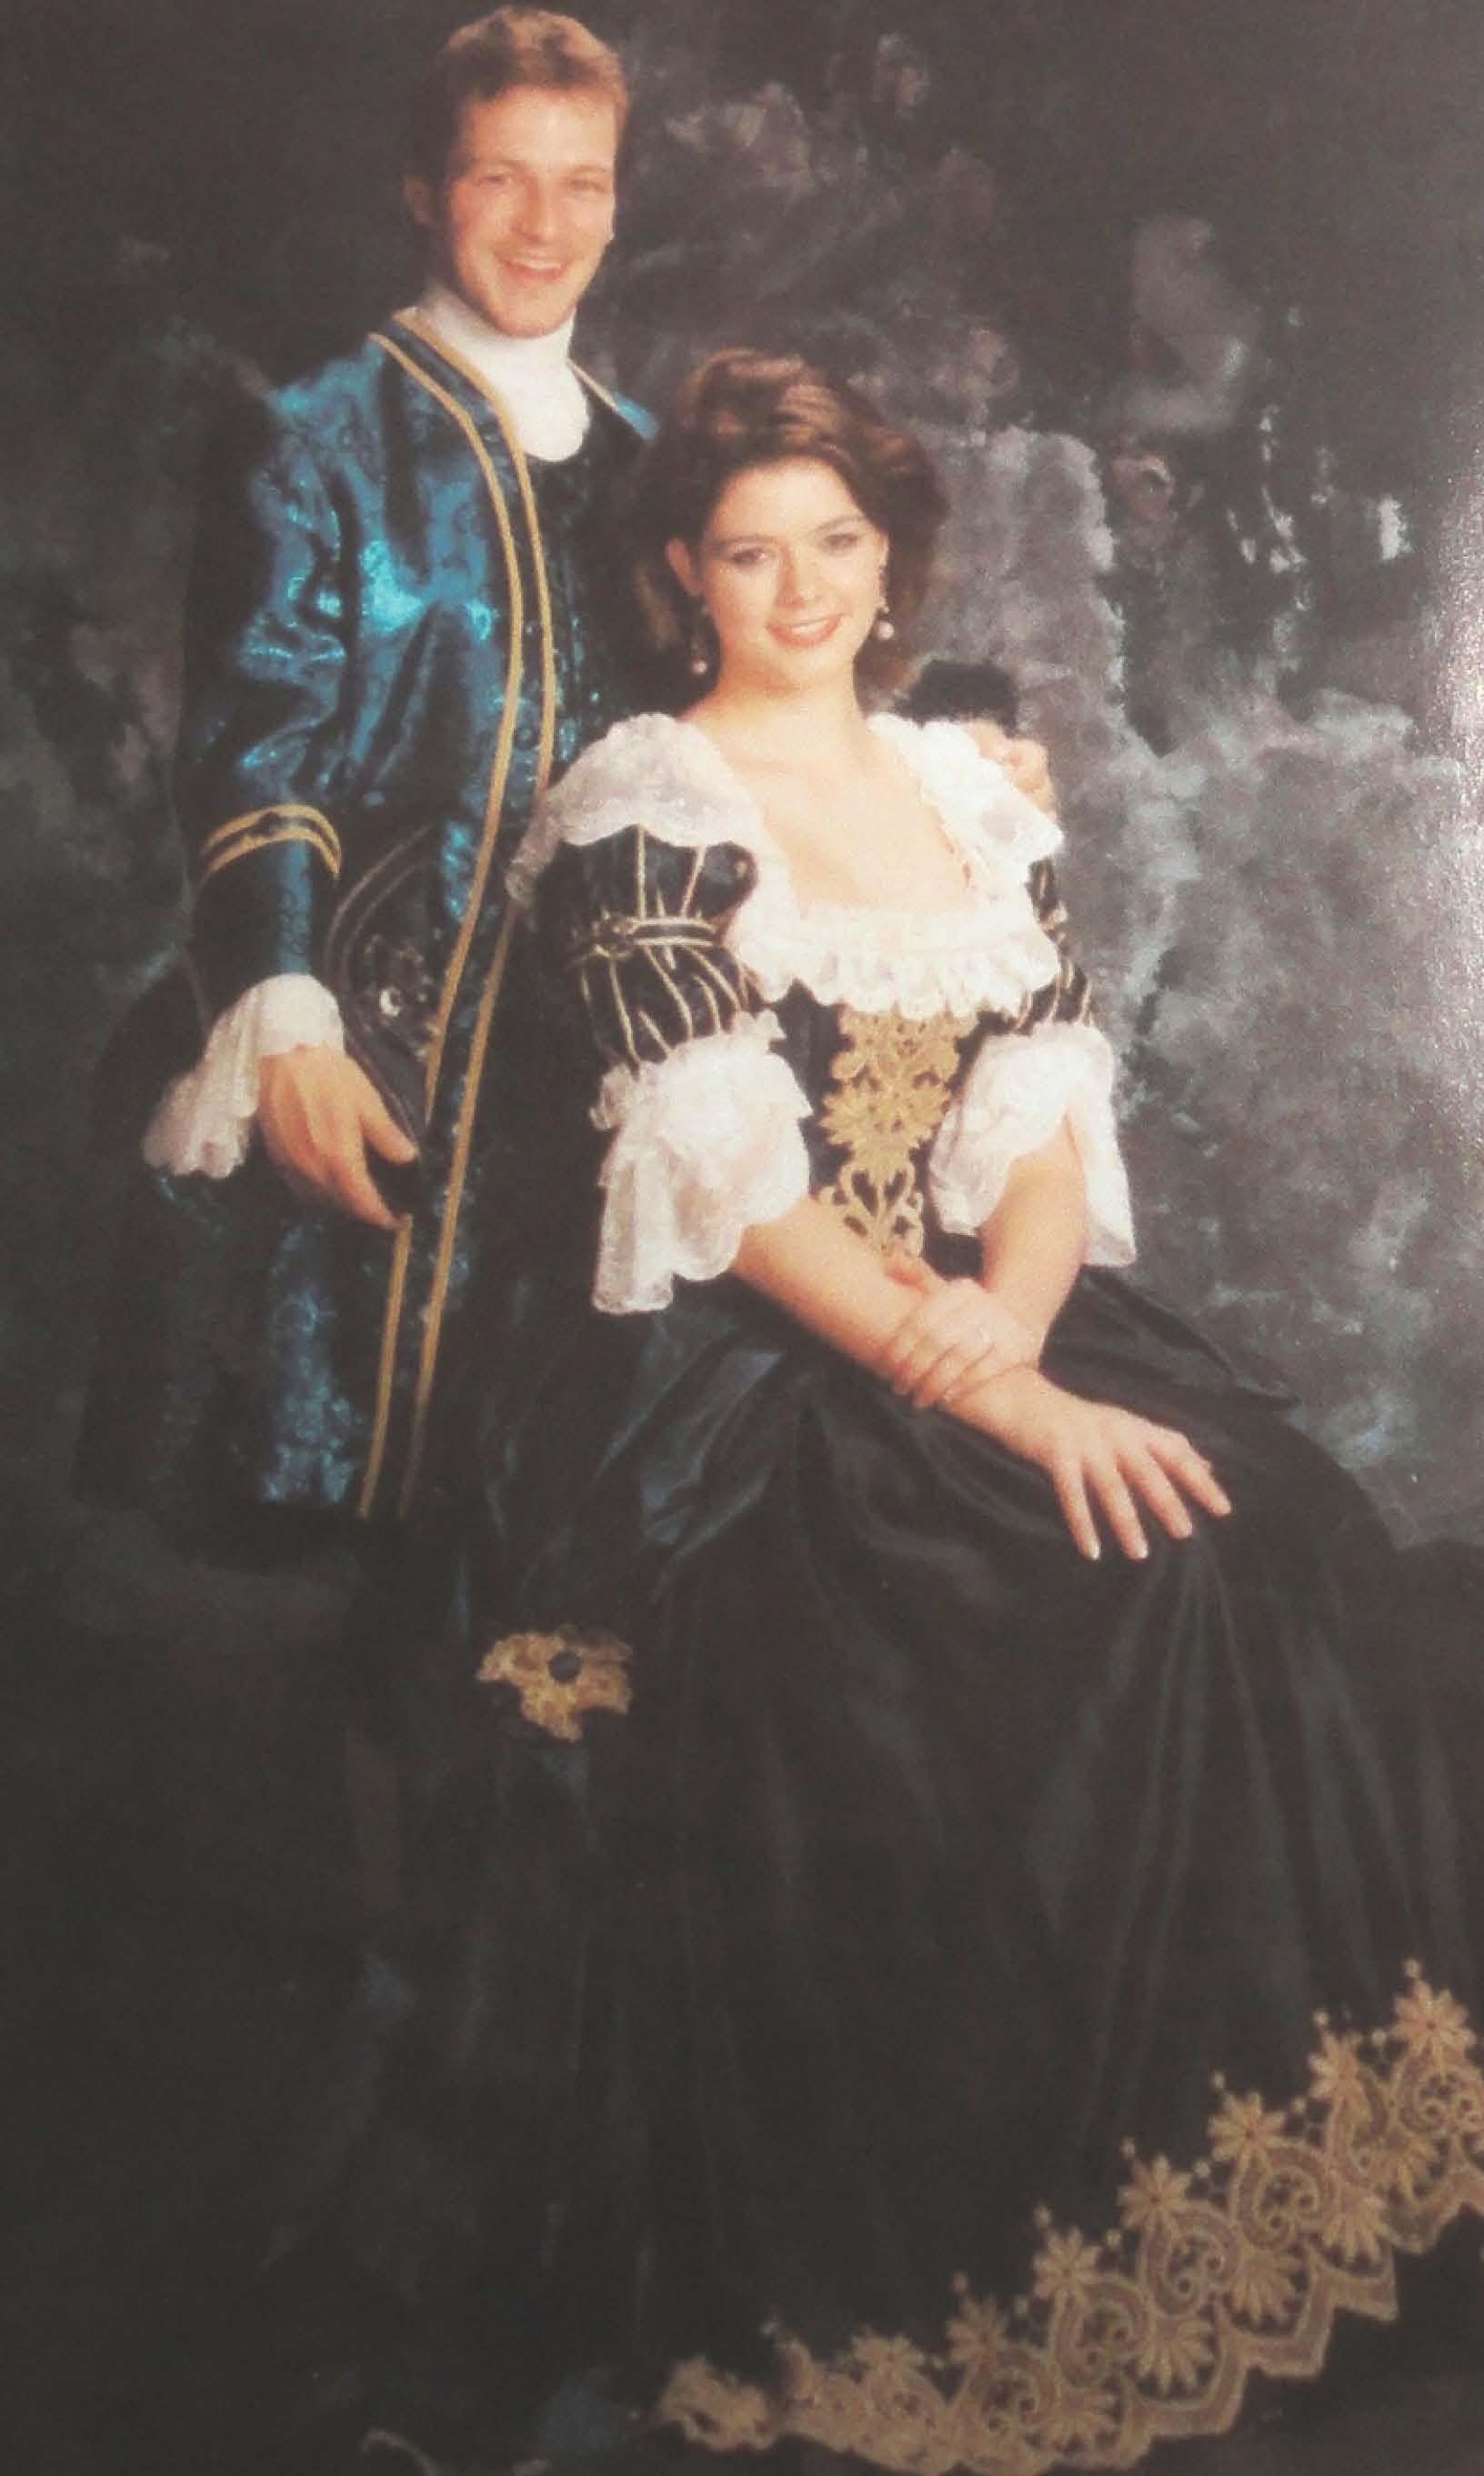 Karl I. & Melanie I., Saison 1998